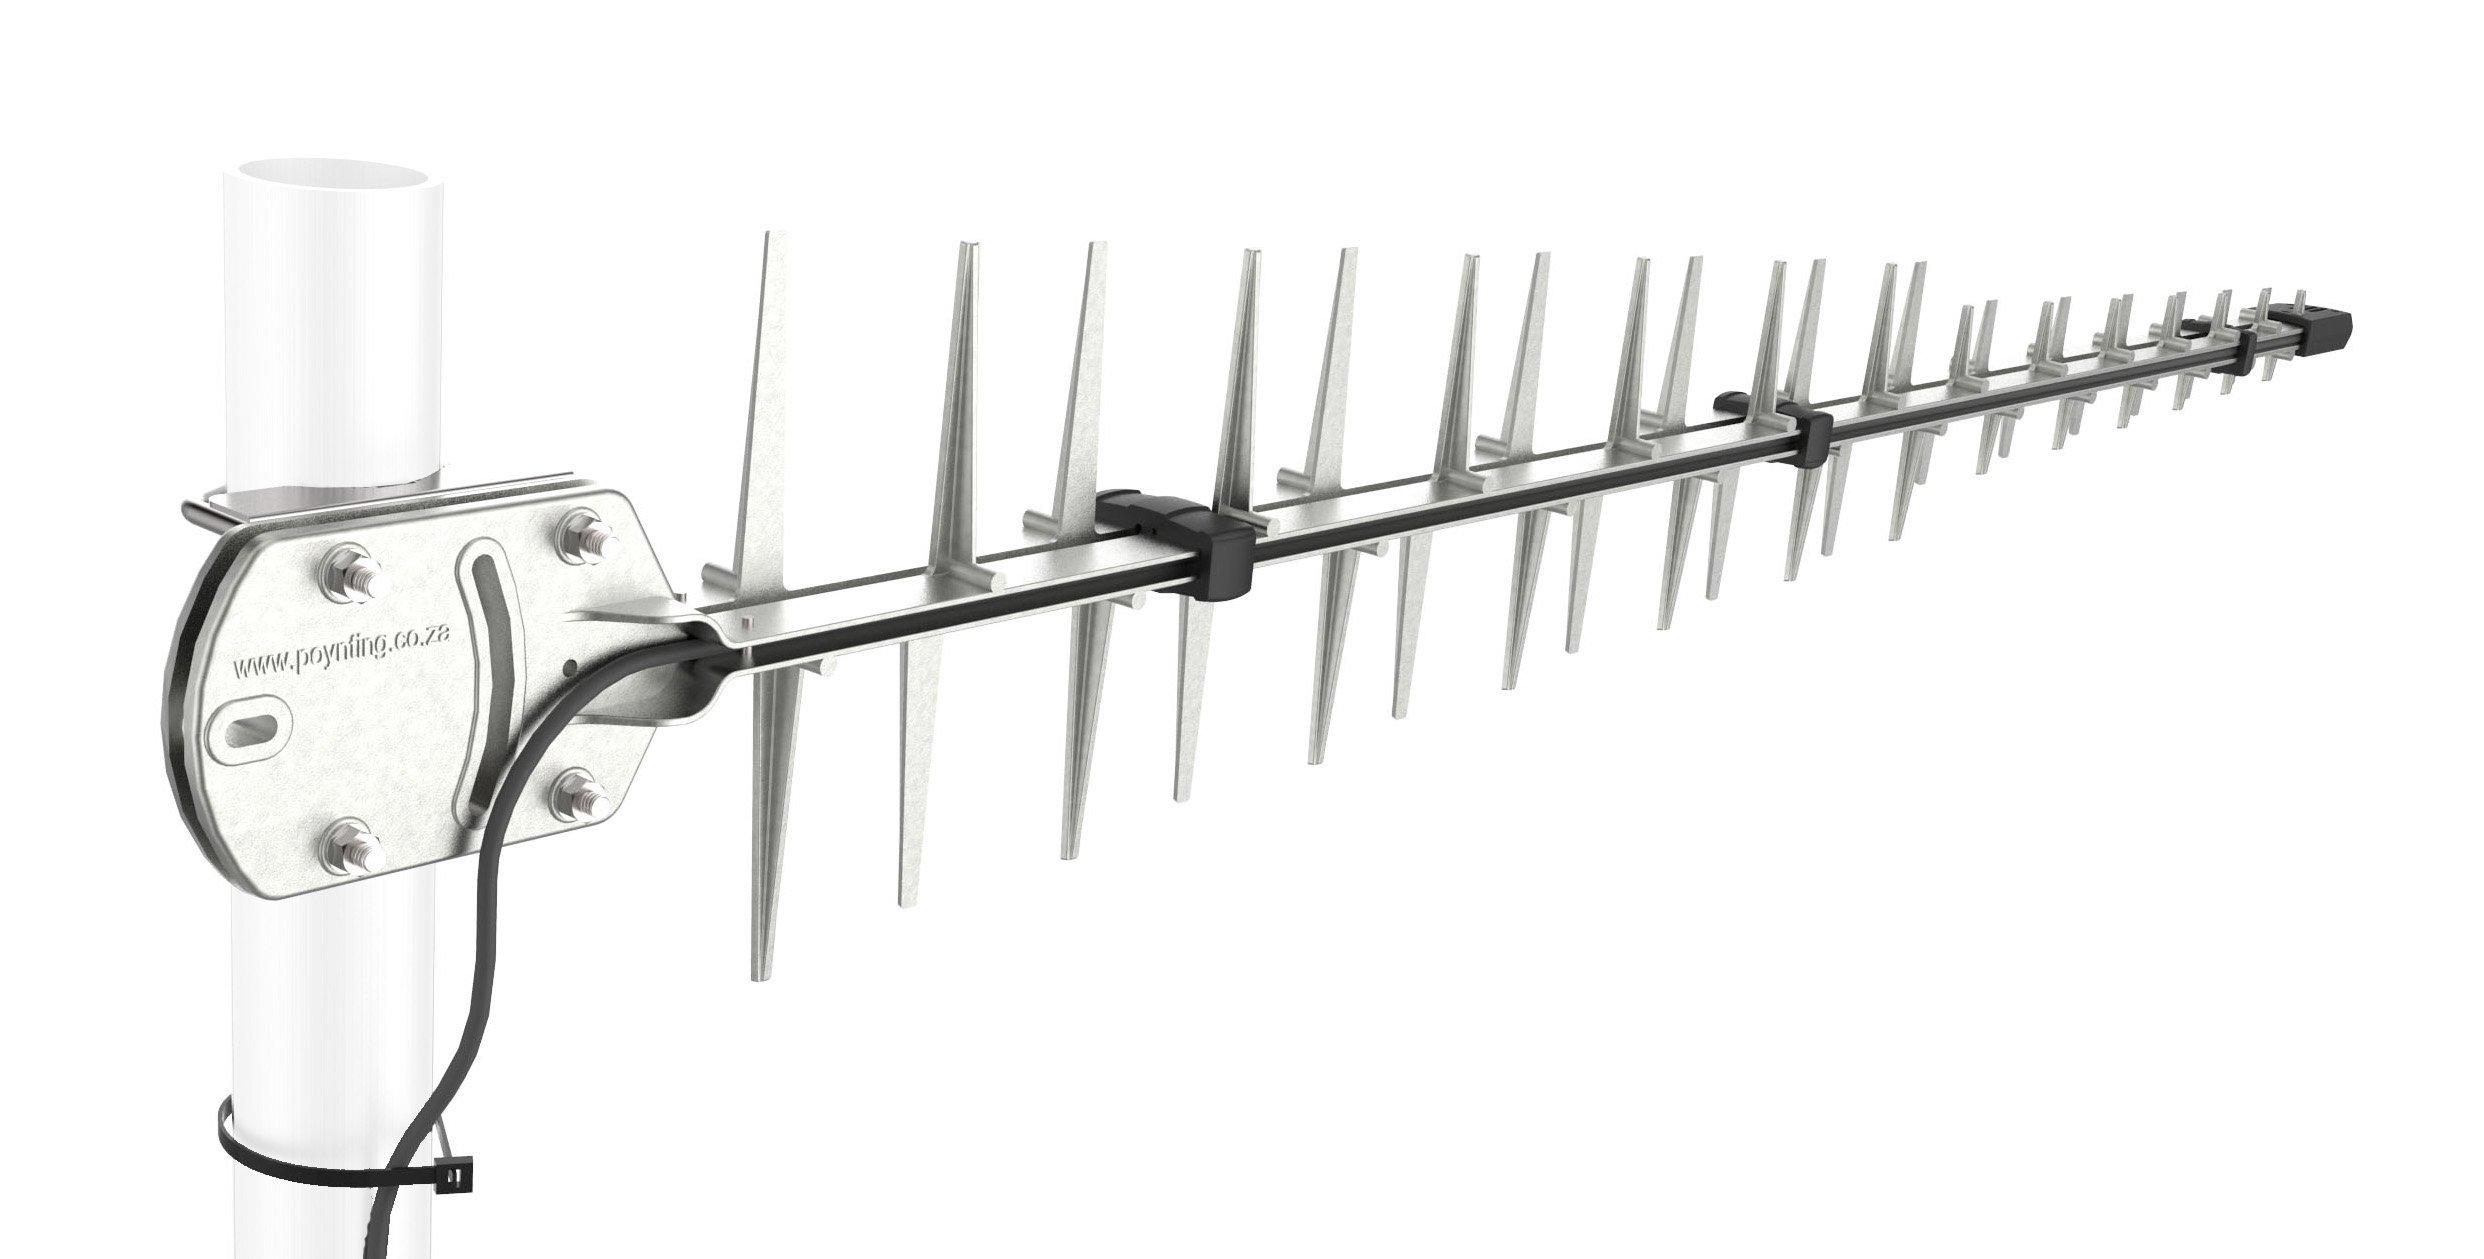 698 - 3000 MHz LPDA High Gain Directional Outdoor Antenna